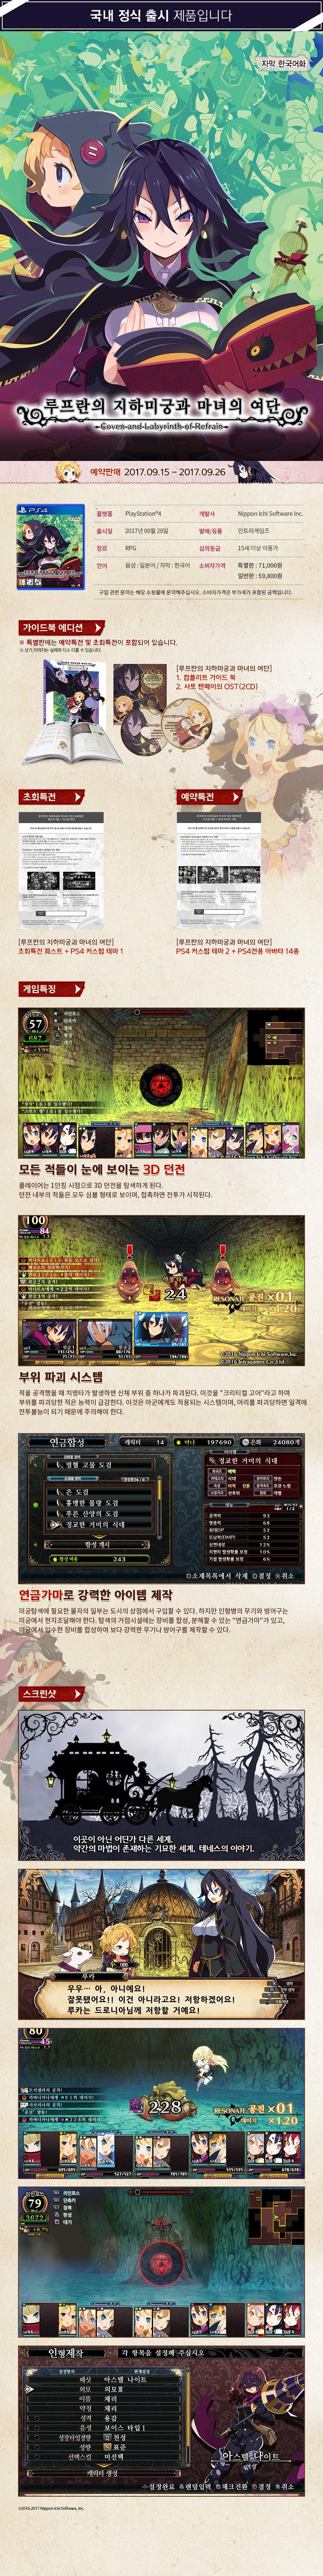 Refrain_PS4.jpg